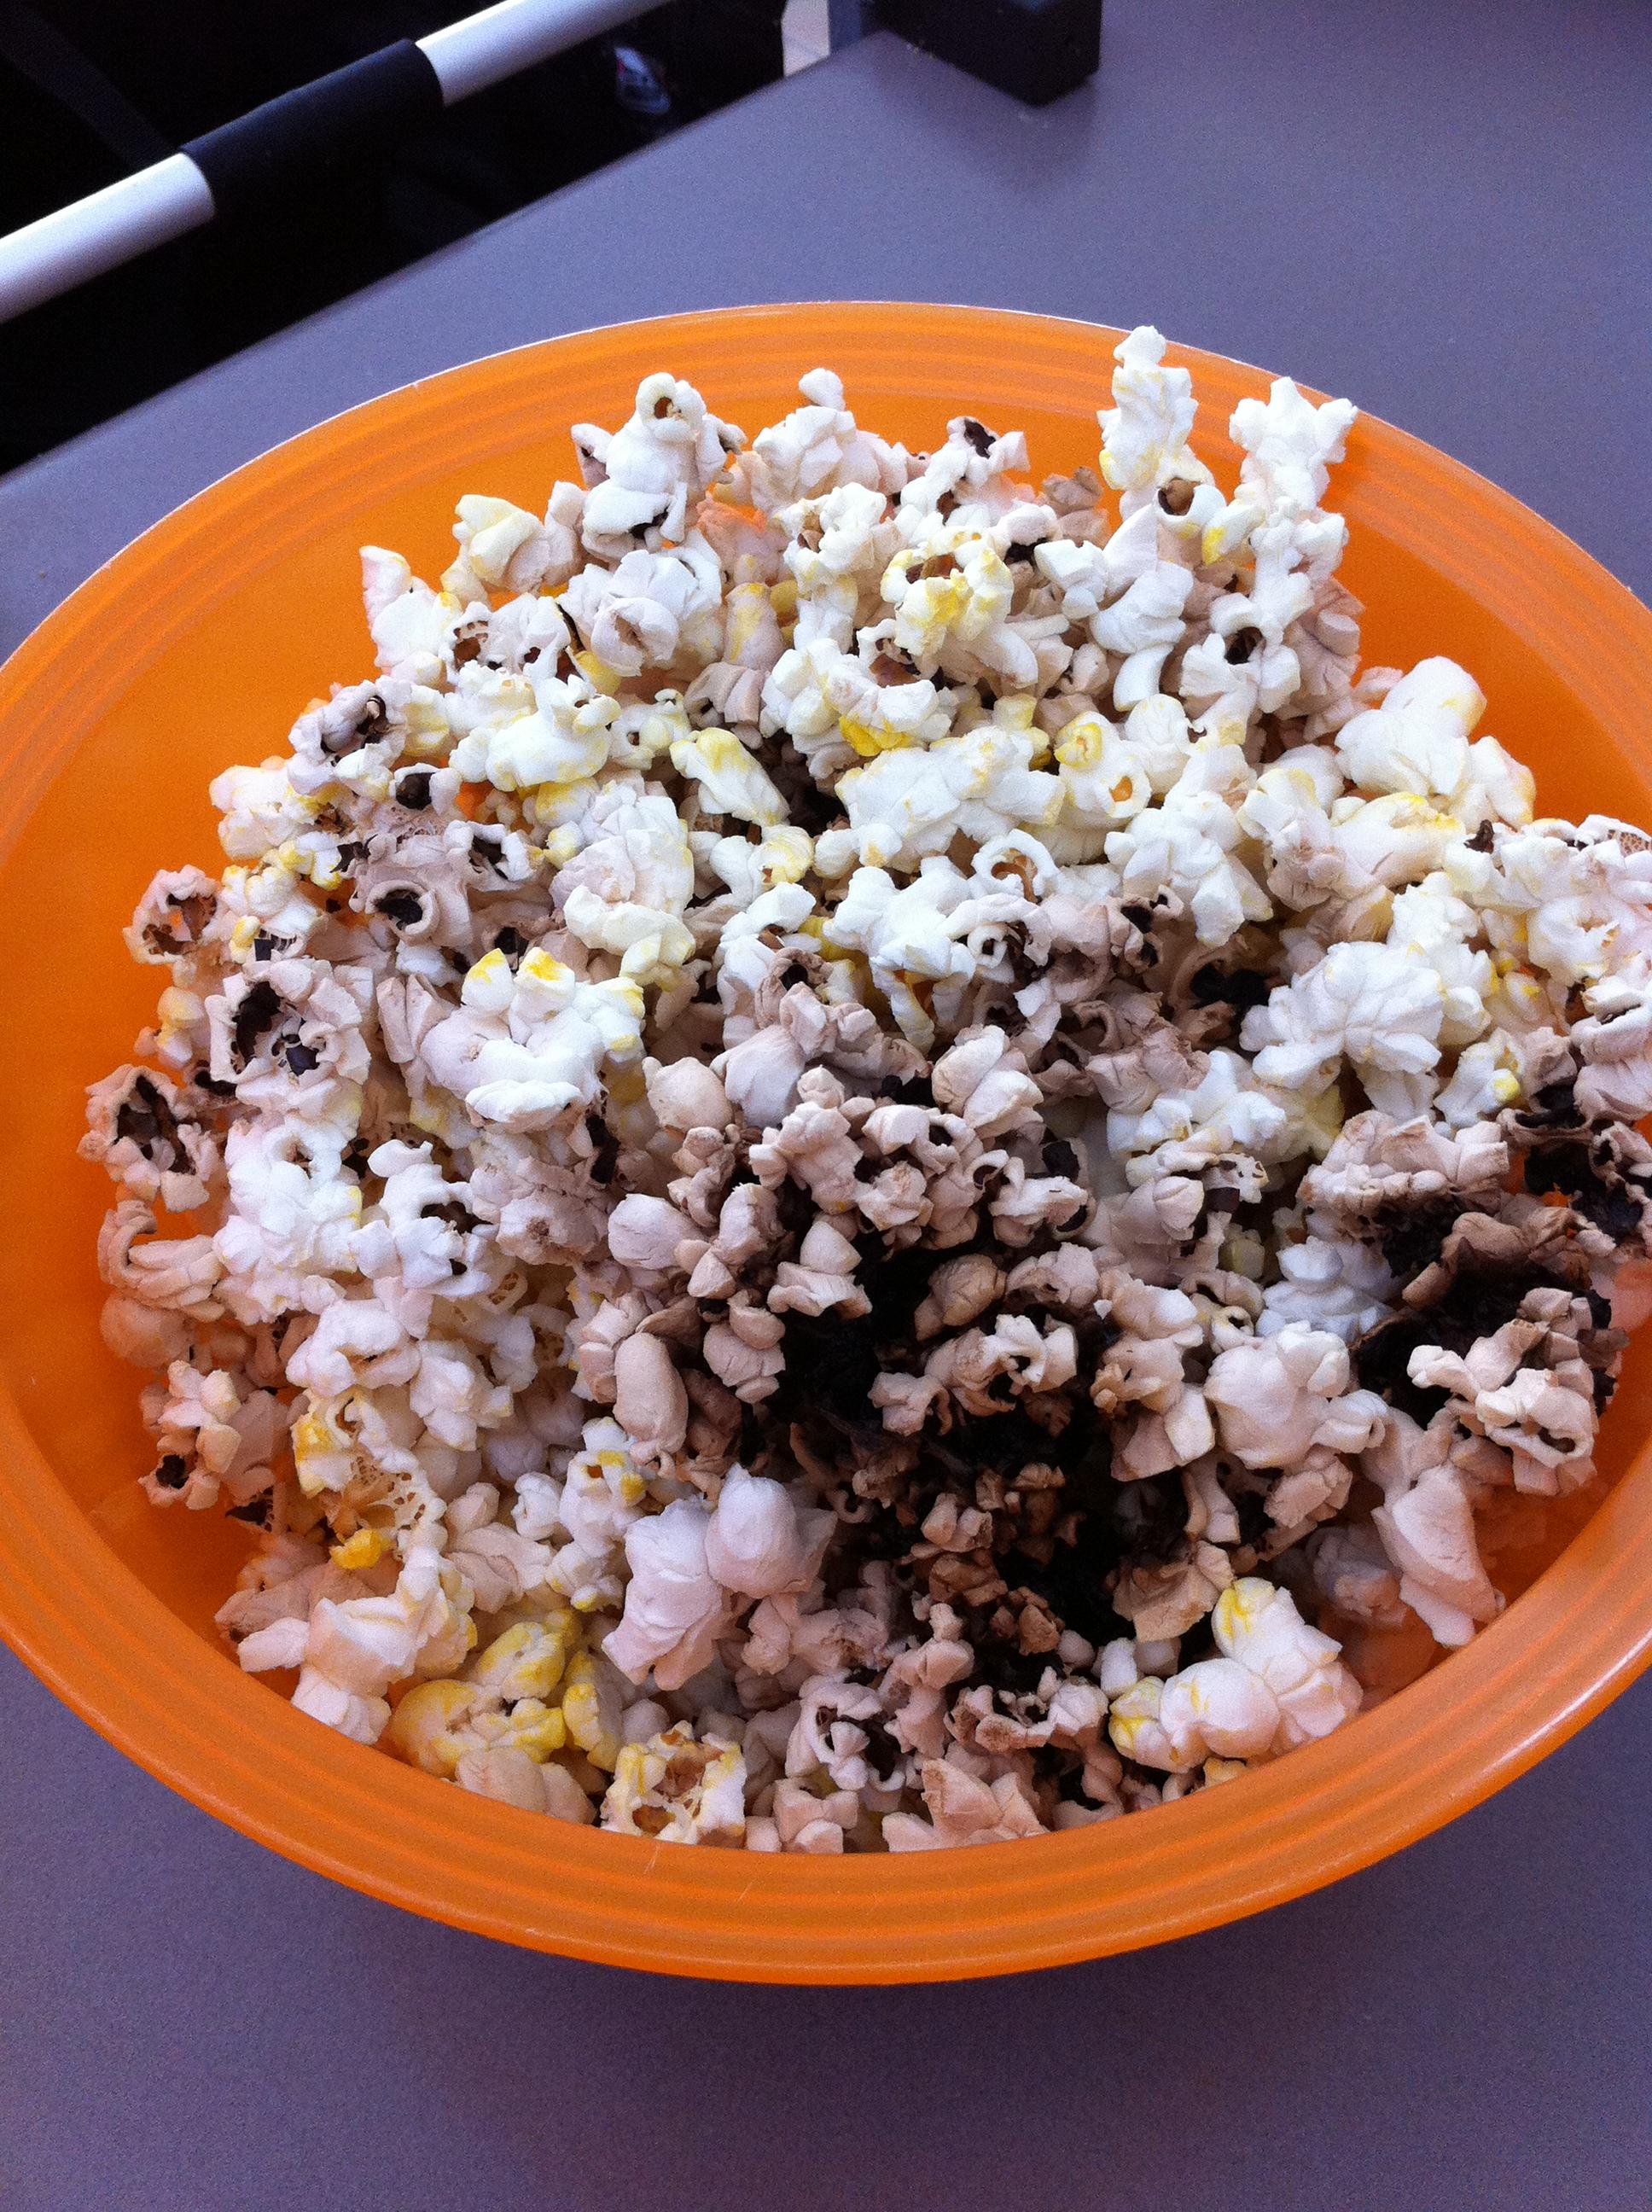 An orange bowl of burnt popcorn